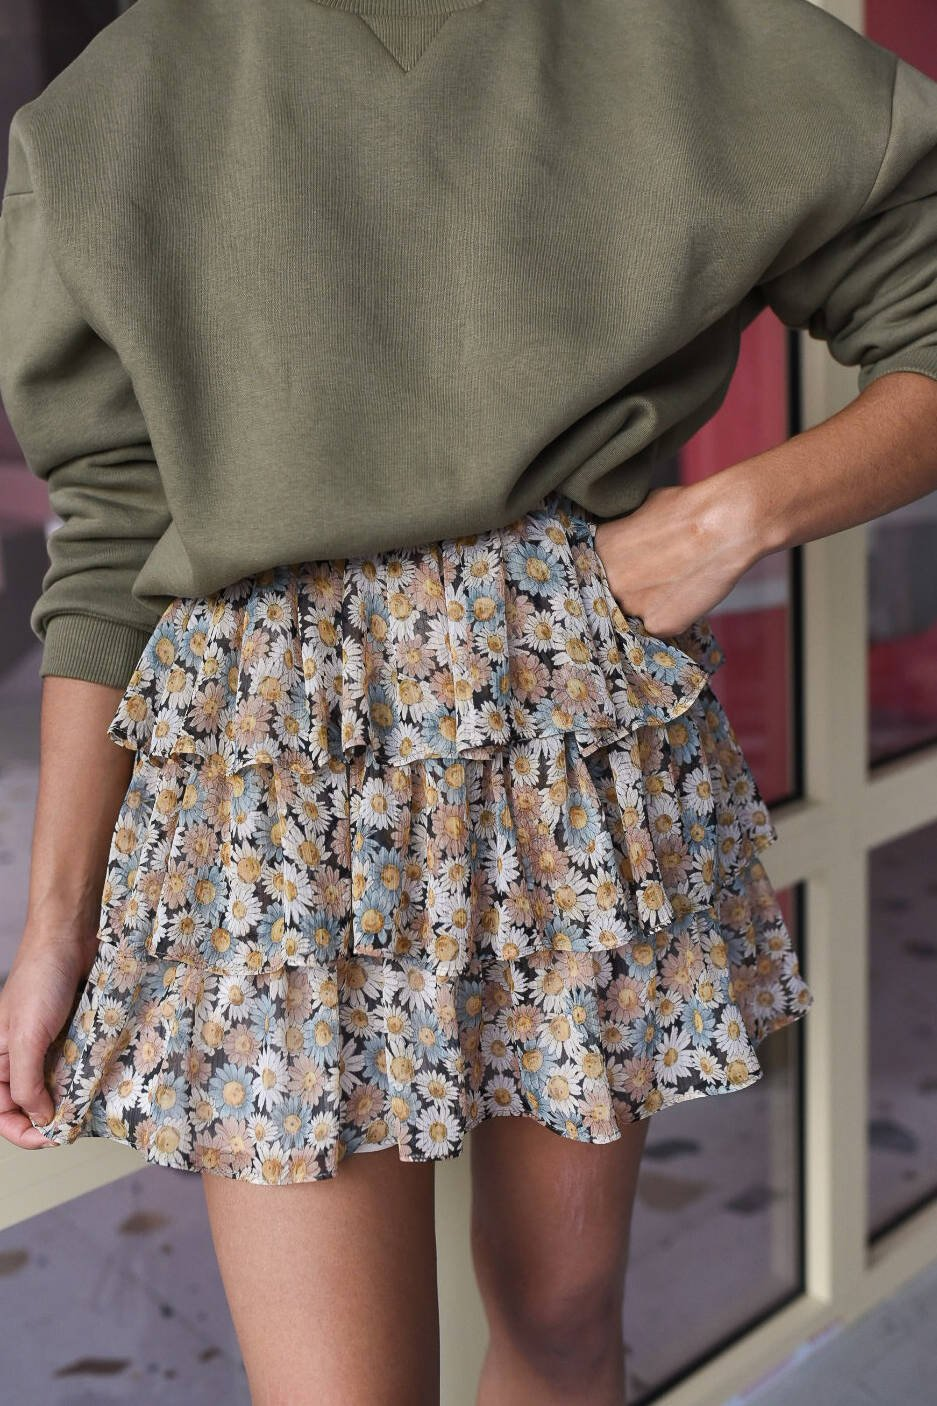 CHEAP Lana Daisy Skirt 28617023969 – Women's Dresses & Skirts